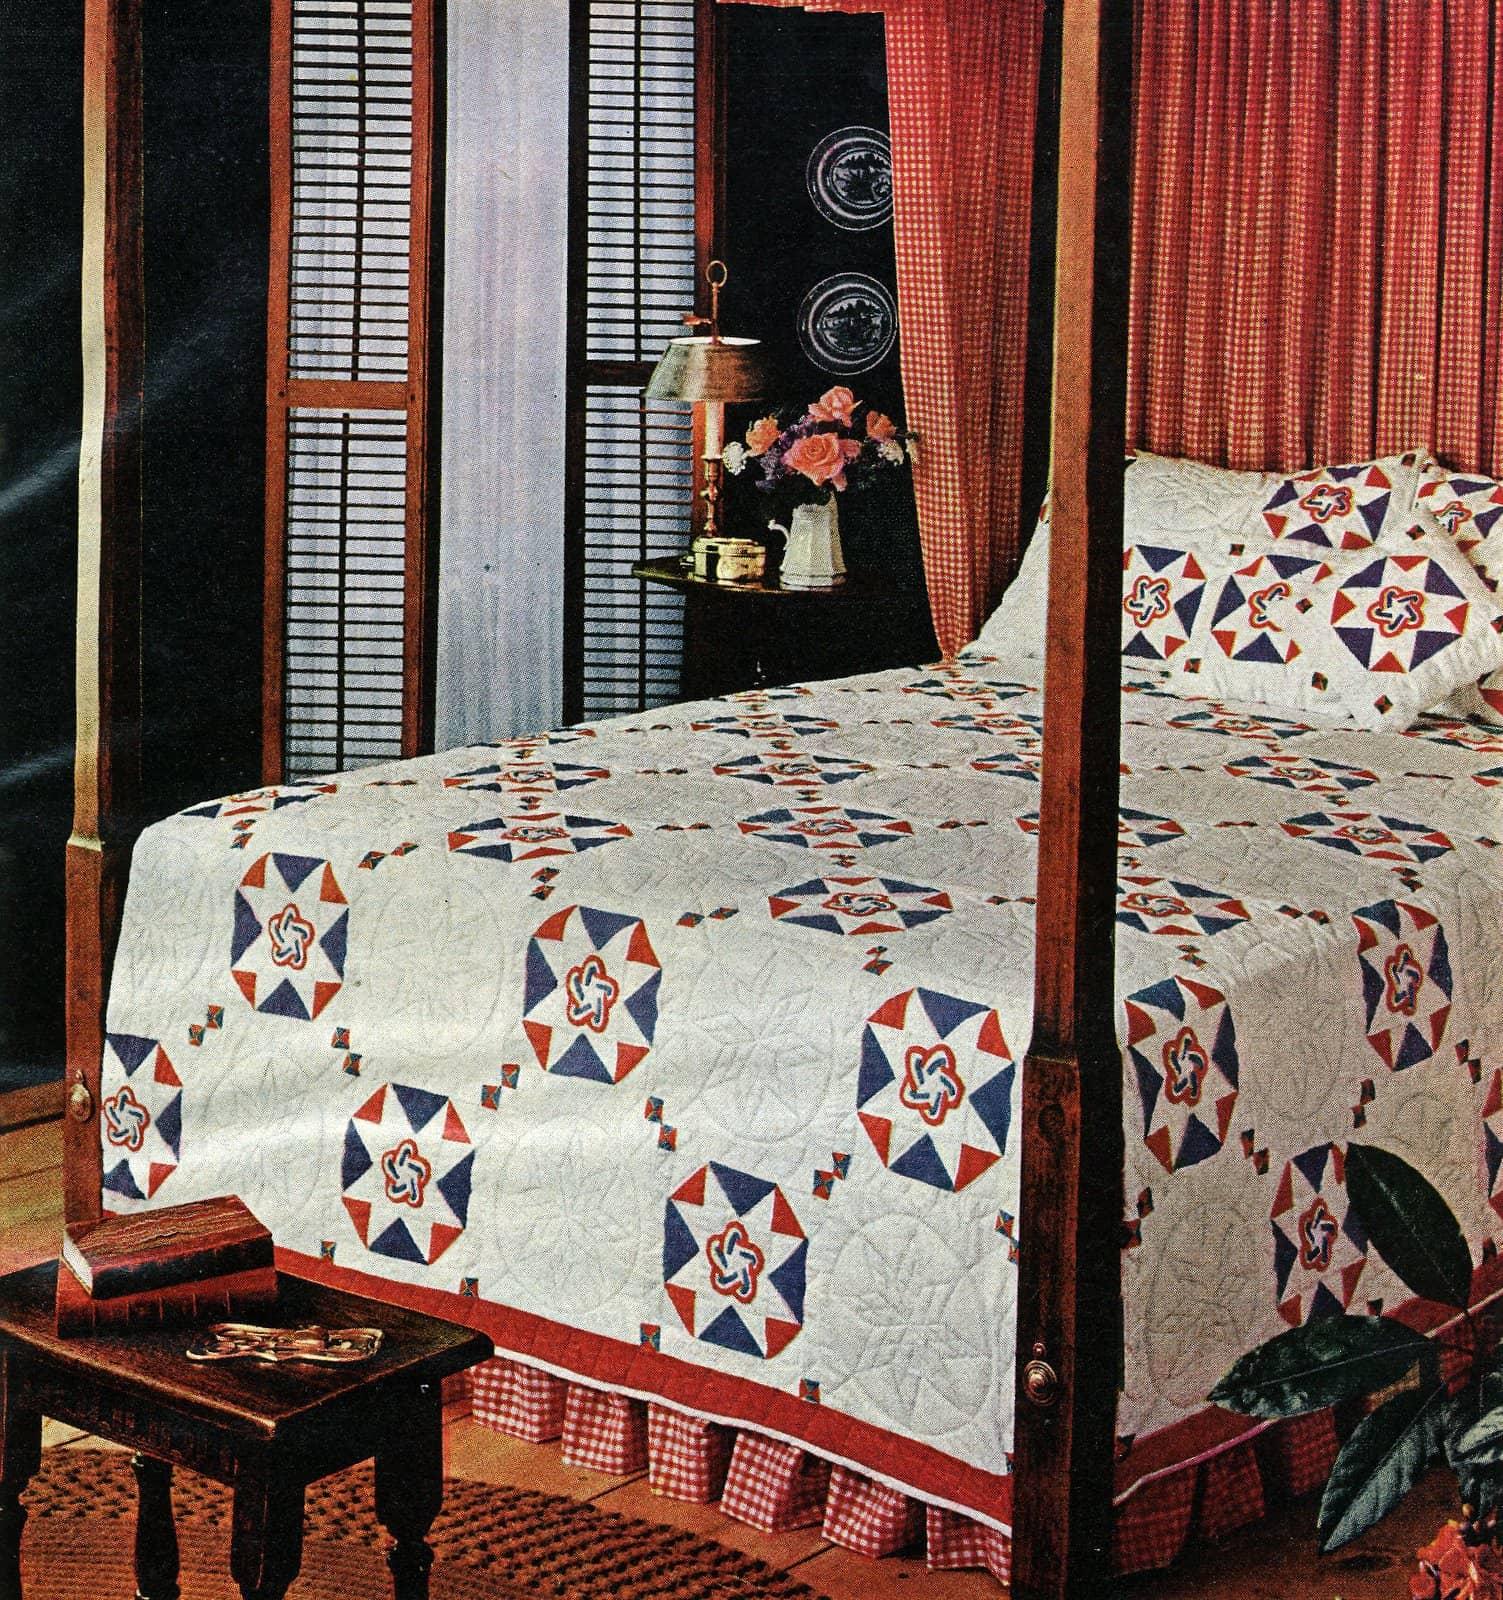 Vintage Bicentennial design quilted bedspread (1976)